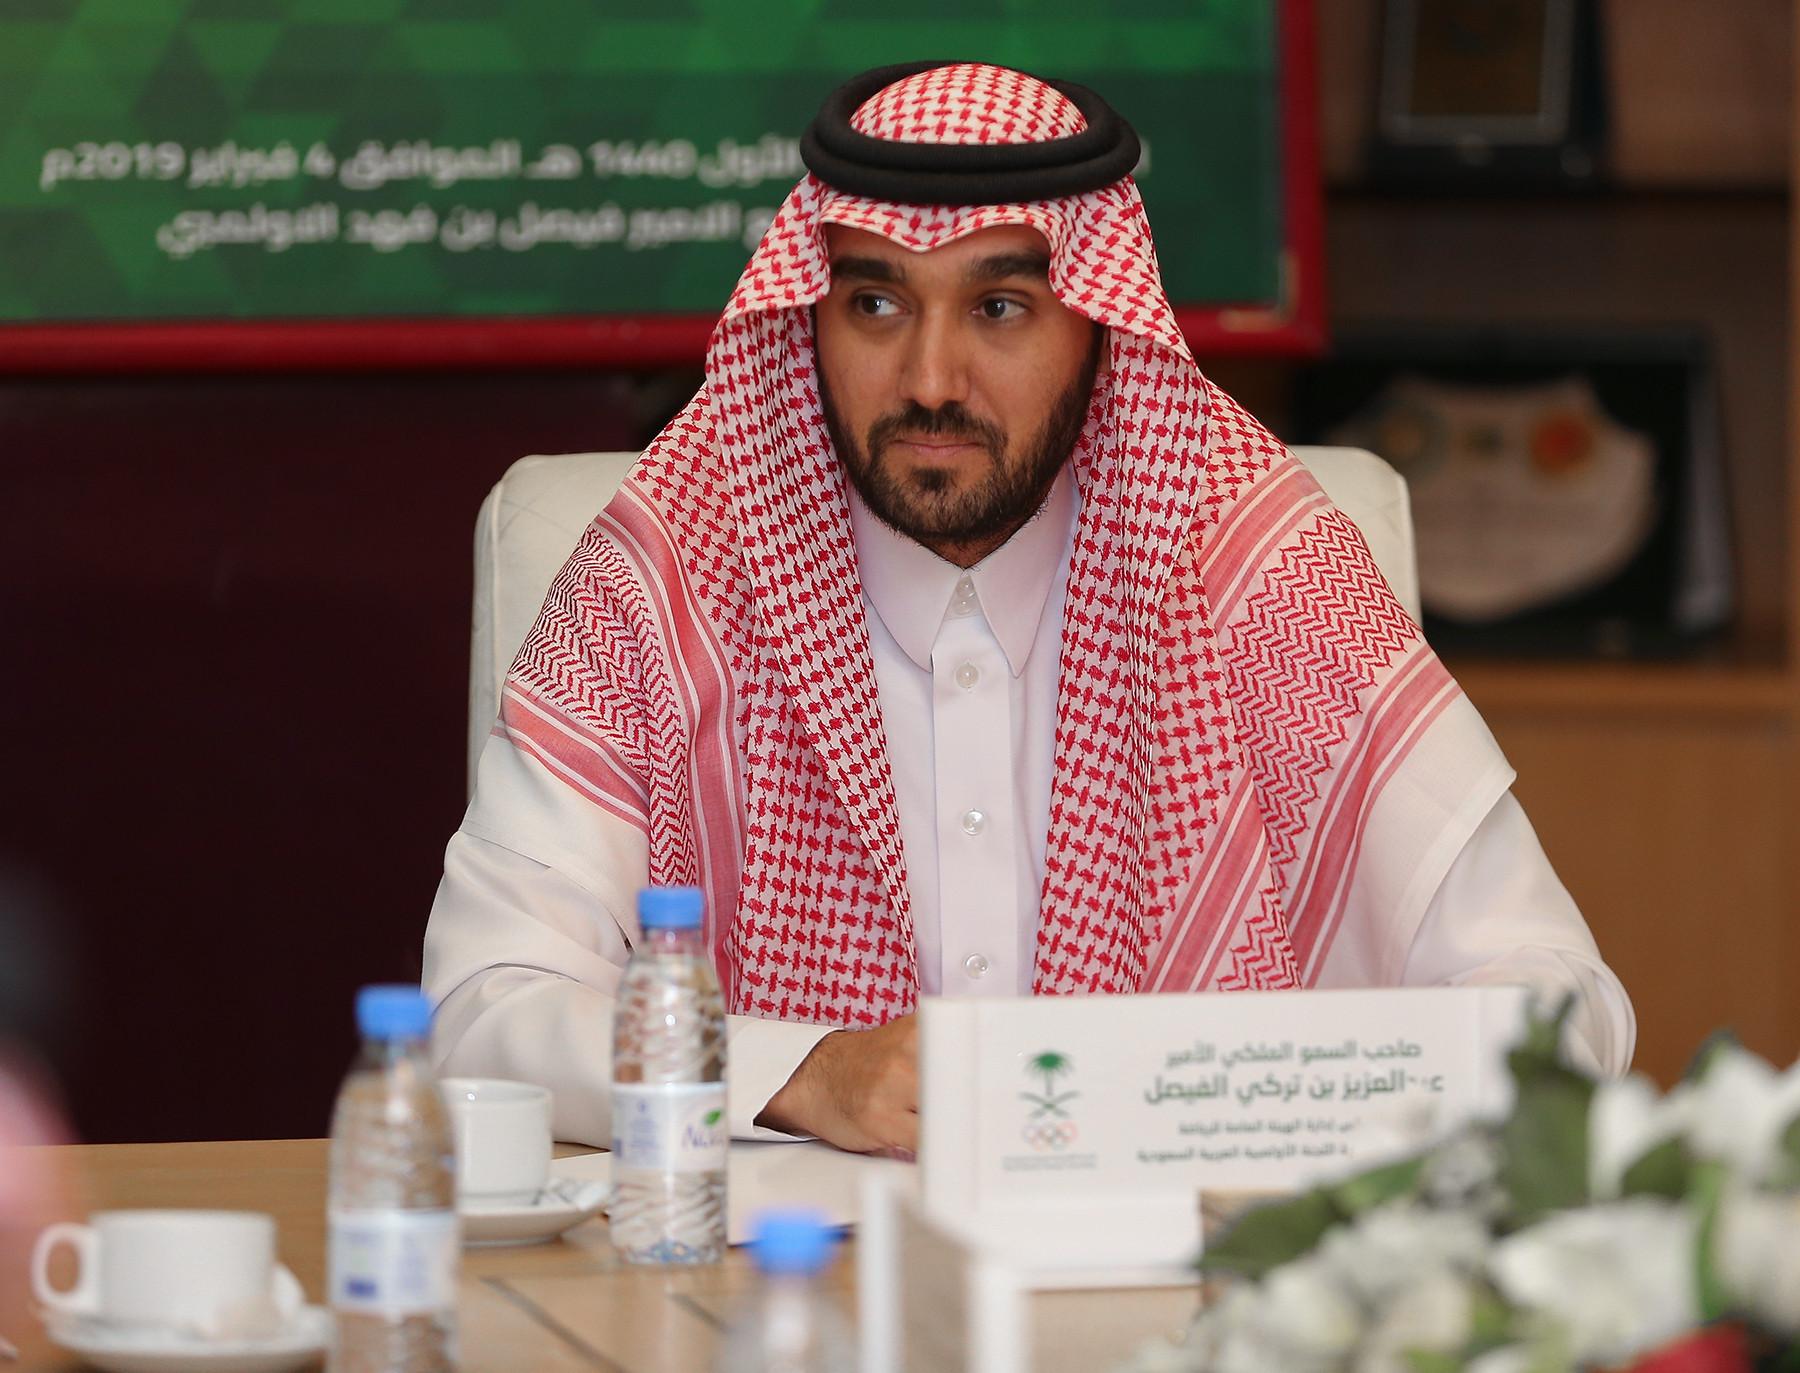 Saudi Arabia NOC hosts inaugural International Athletes' Virtual Forum